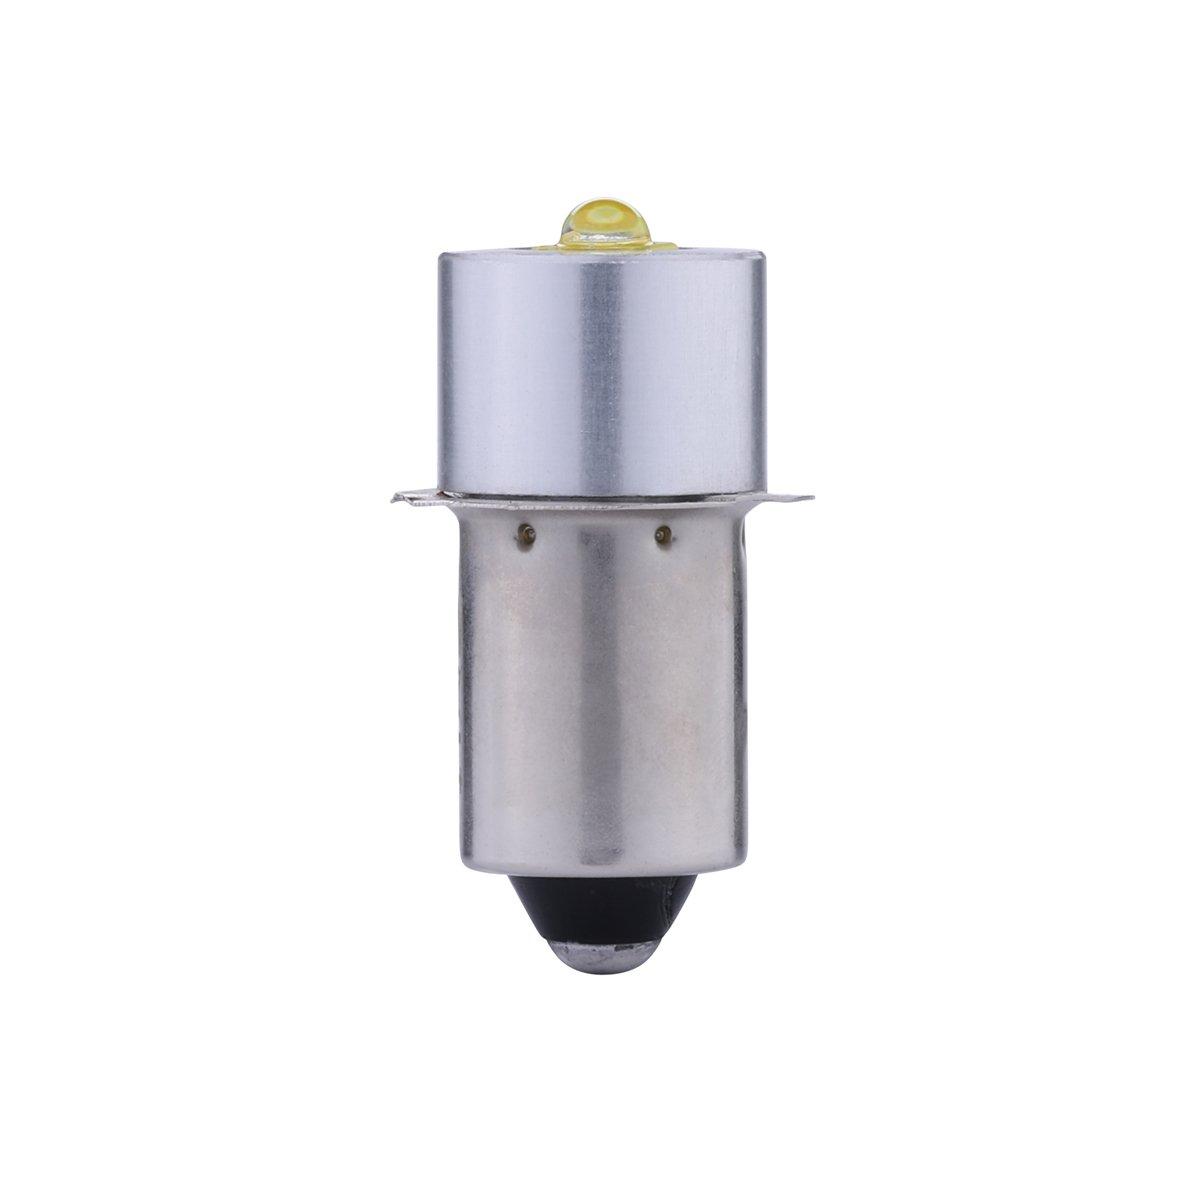 JOMITOP 18v Led Flashlight Bulb LED Upgrade Bulb for Ryobi Milwaukee Craftsman 18V Lamp Maglite Flashlight DC Replacement Bulbs Led Conversion Kit